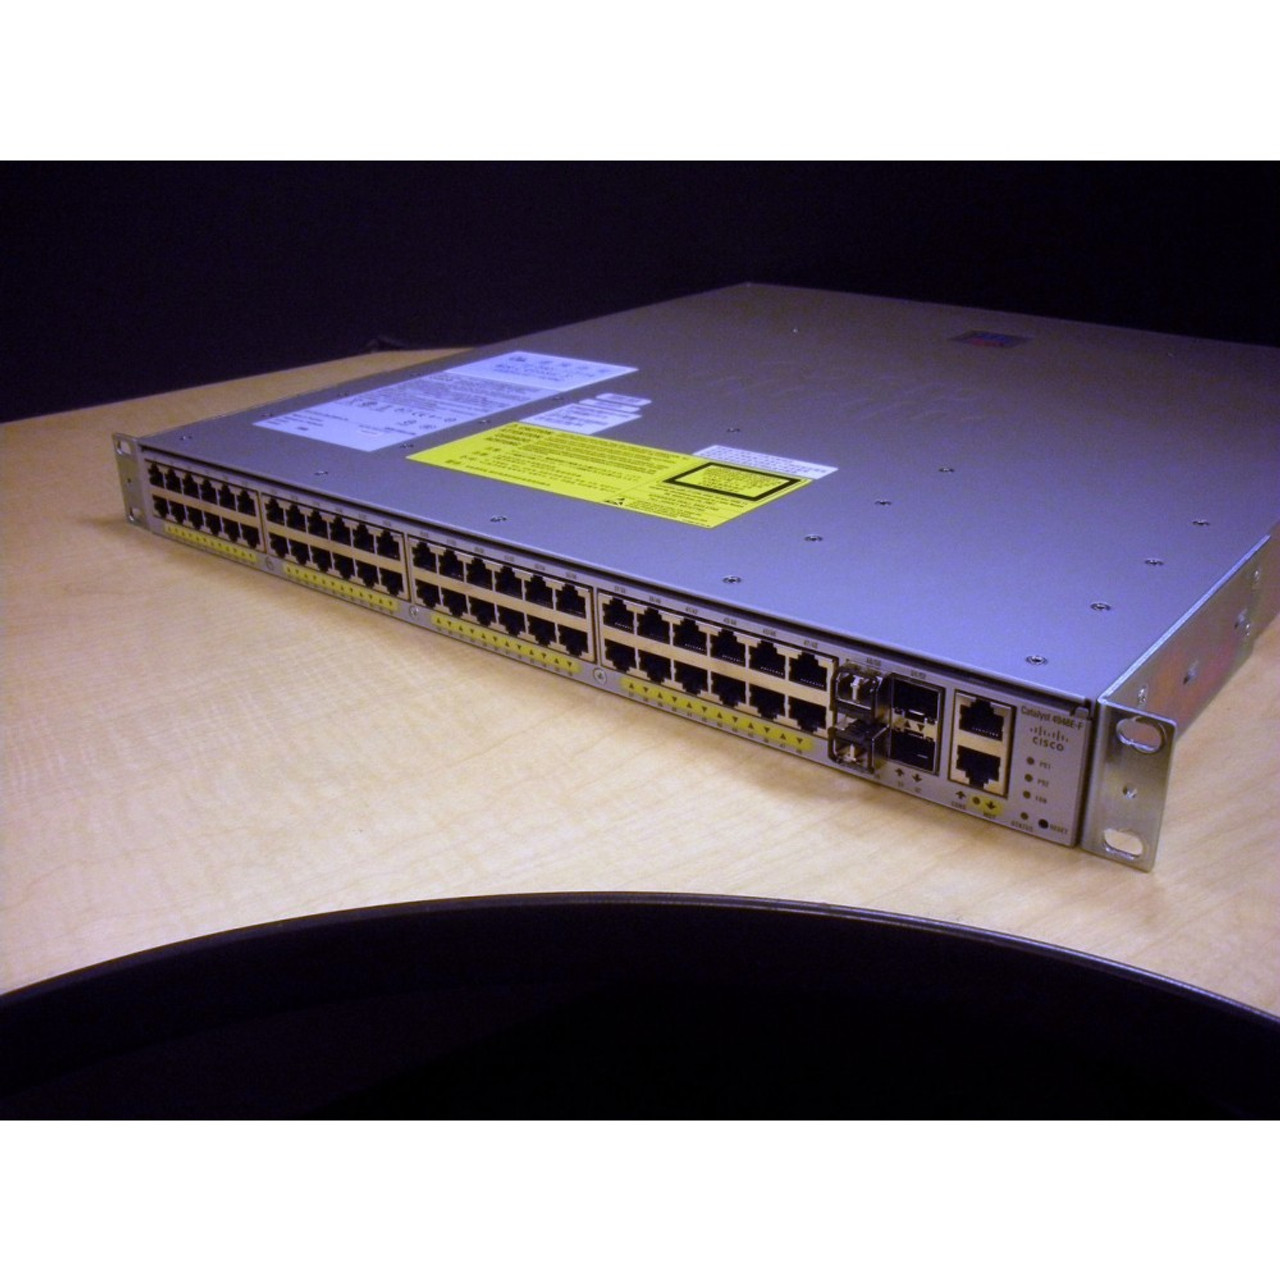 Cisco WS-C4948E-F Catalyst 4500 Series 48 Port Switch